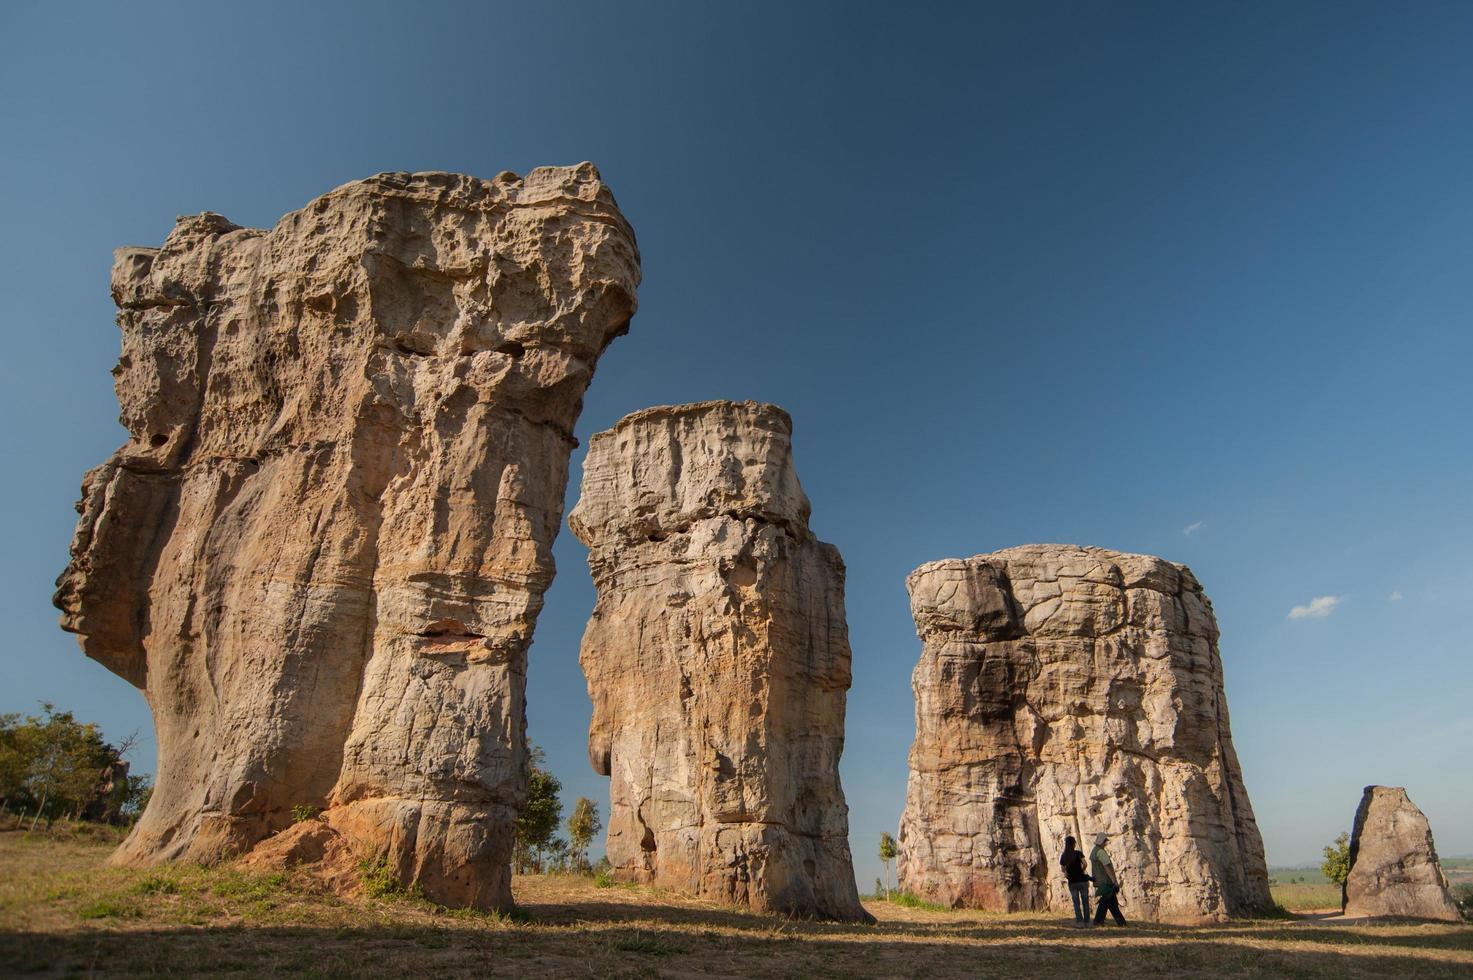 Stonehenge della Thailandia mo hin khao nella provincia di Chaiyaphum Thailandia foto